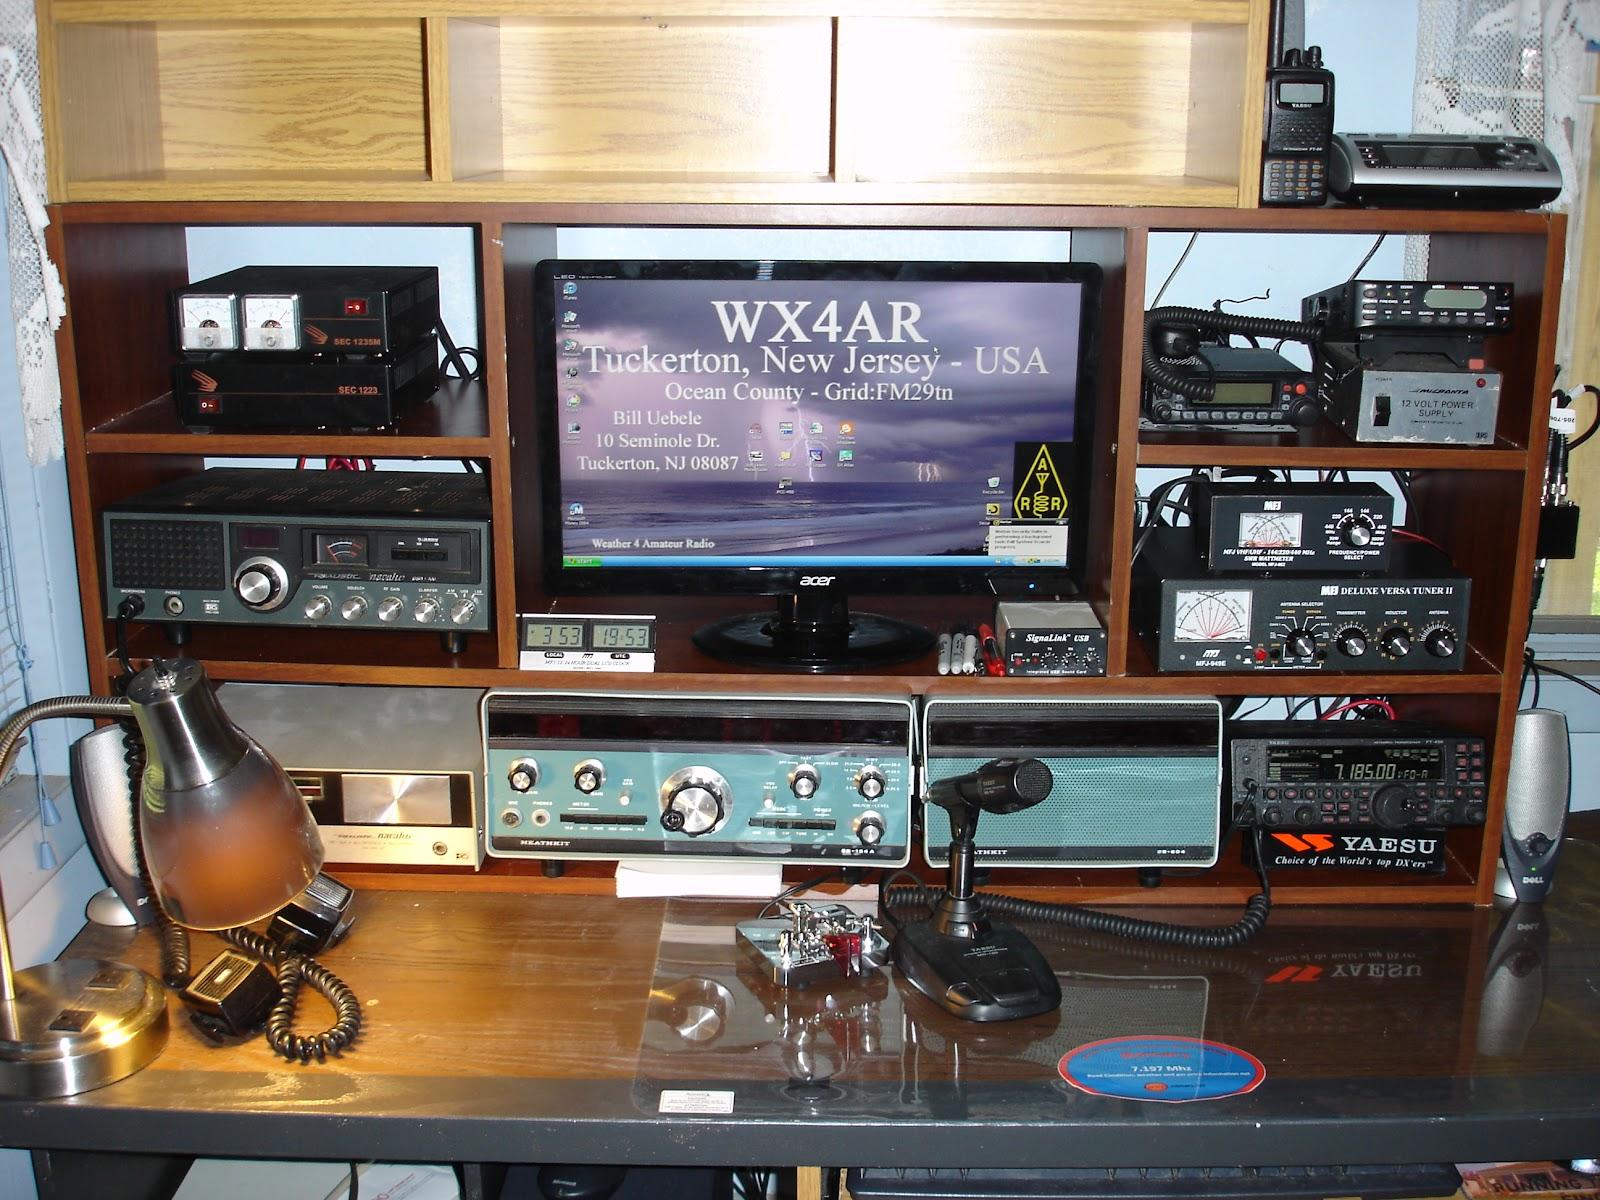 Amateur Radio Station Wb4omm: Amateur Radio Station WX4AR: September 2010